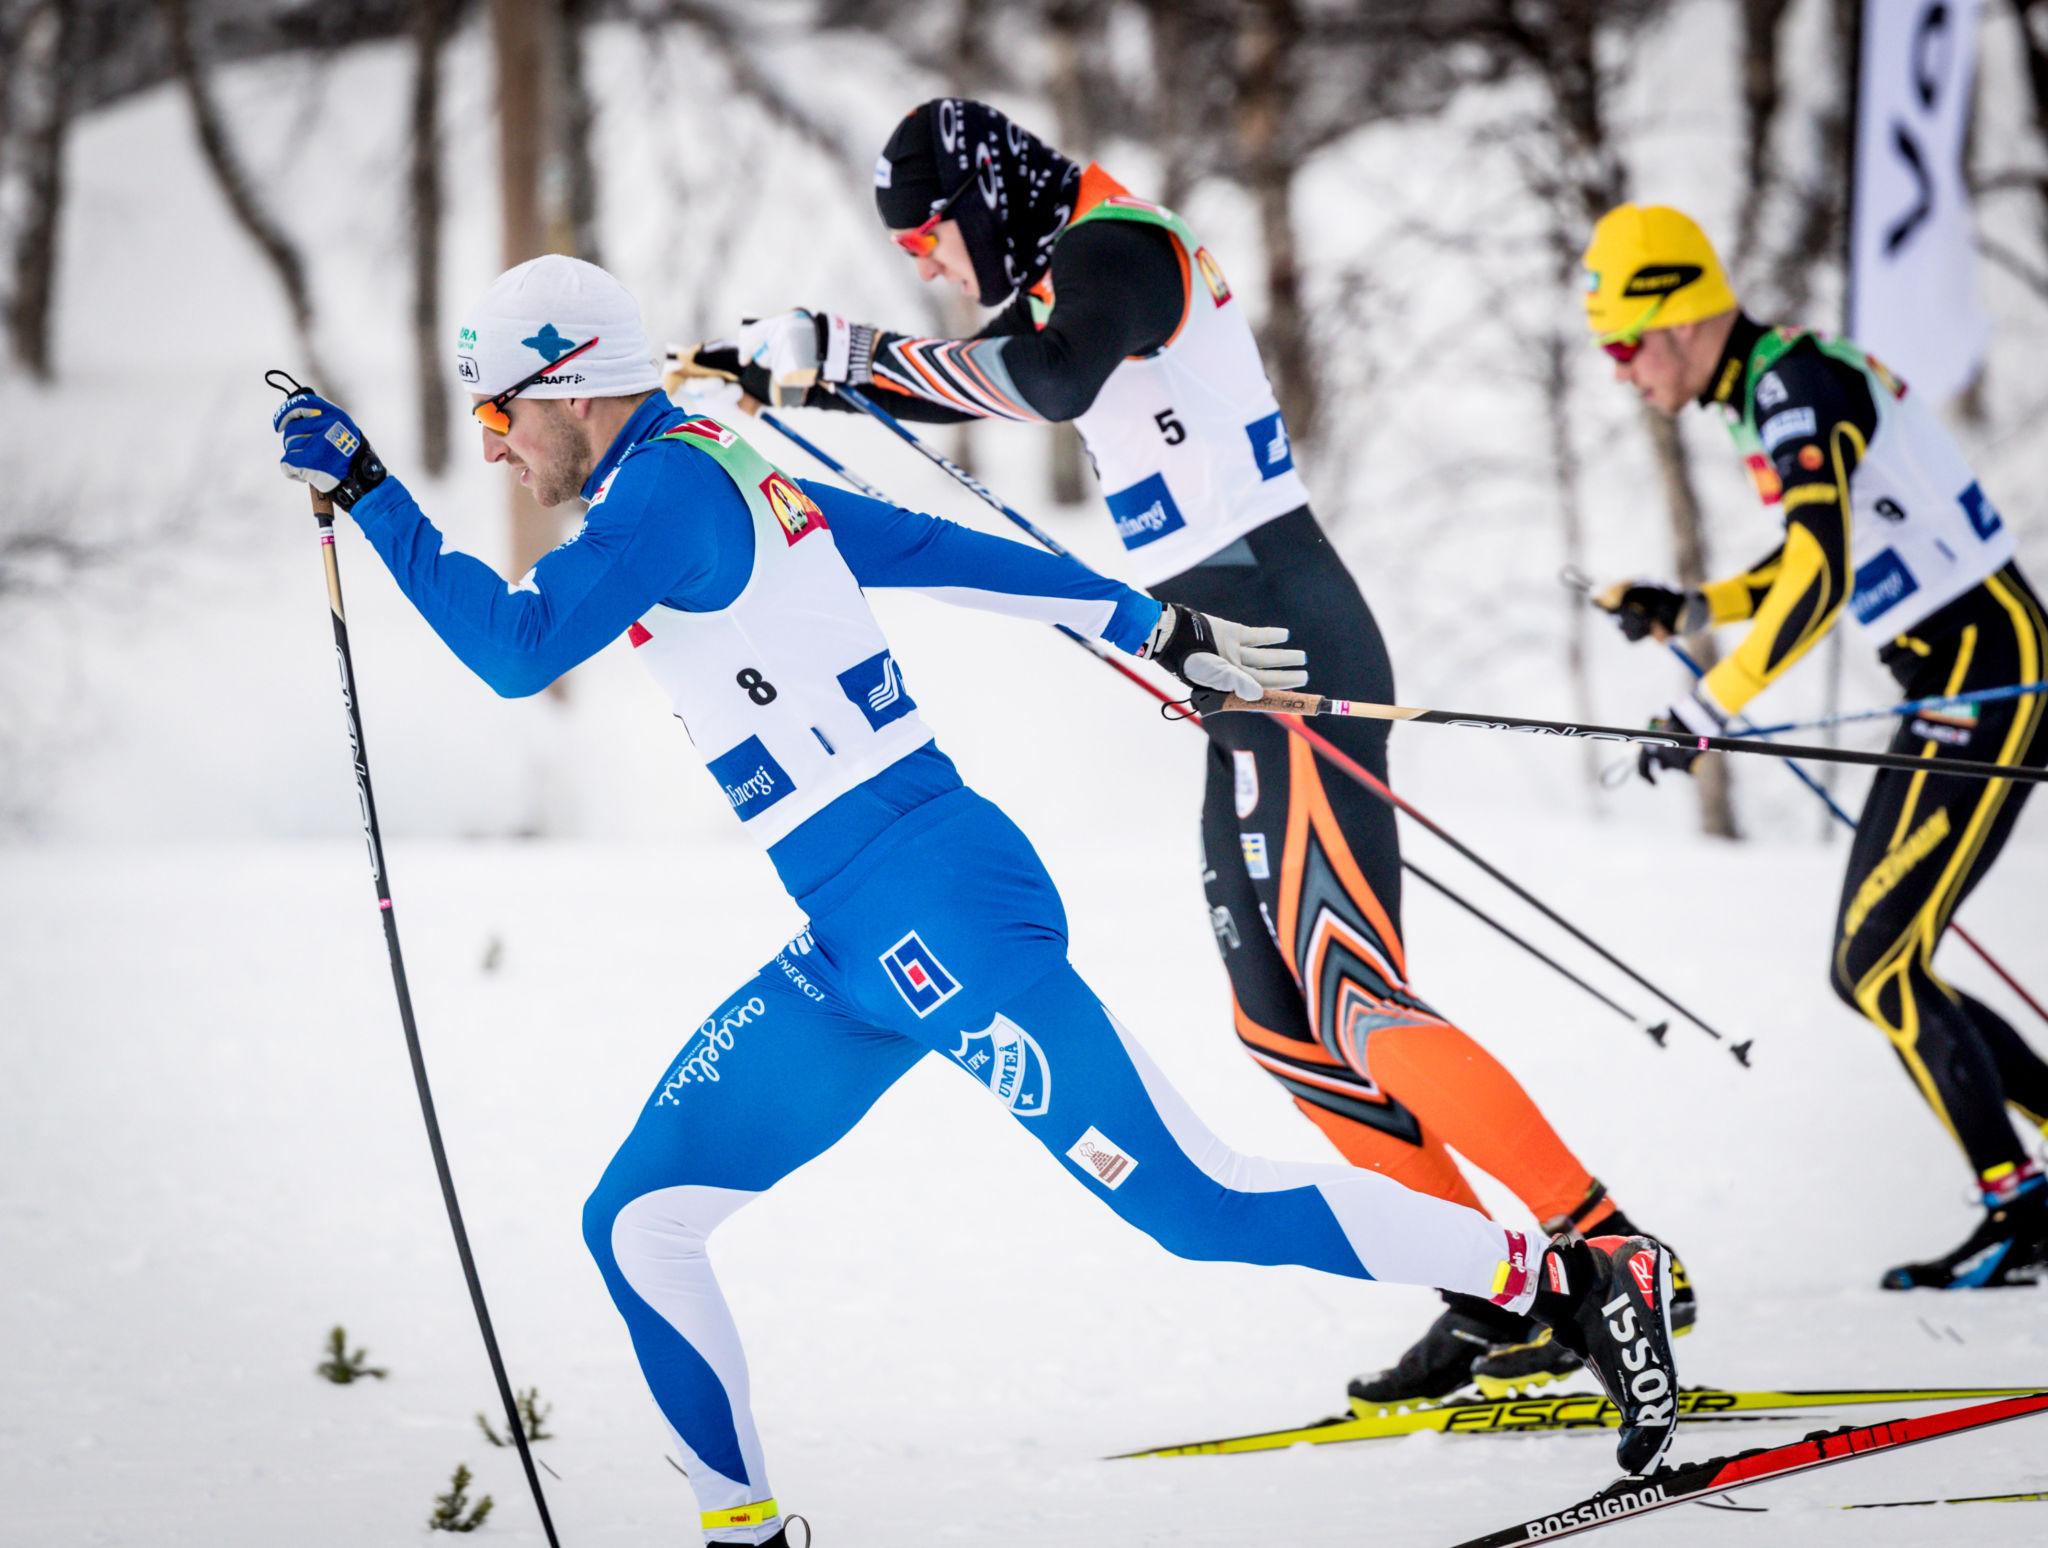 nordic-ski-marathon